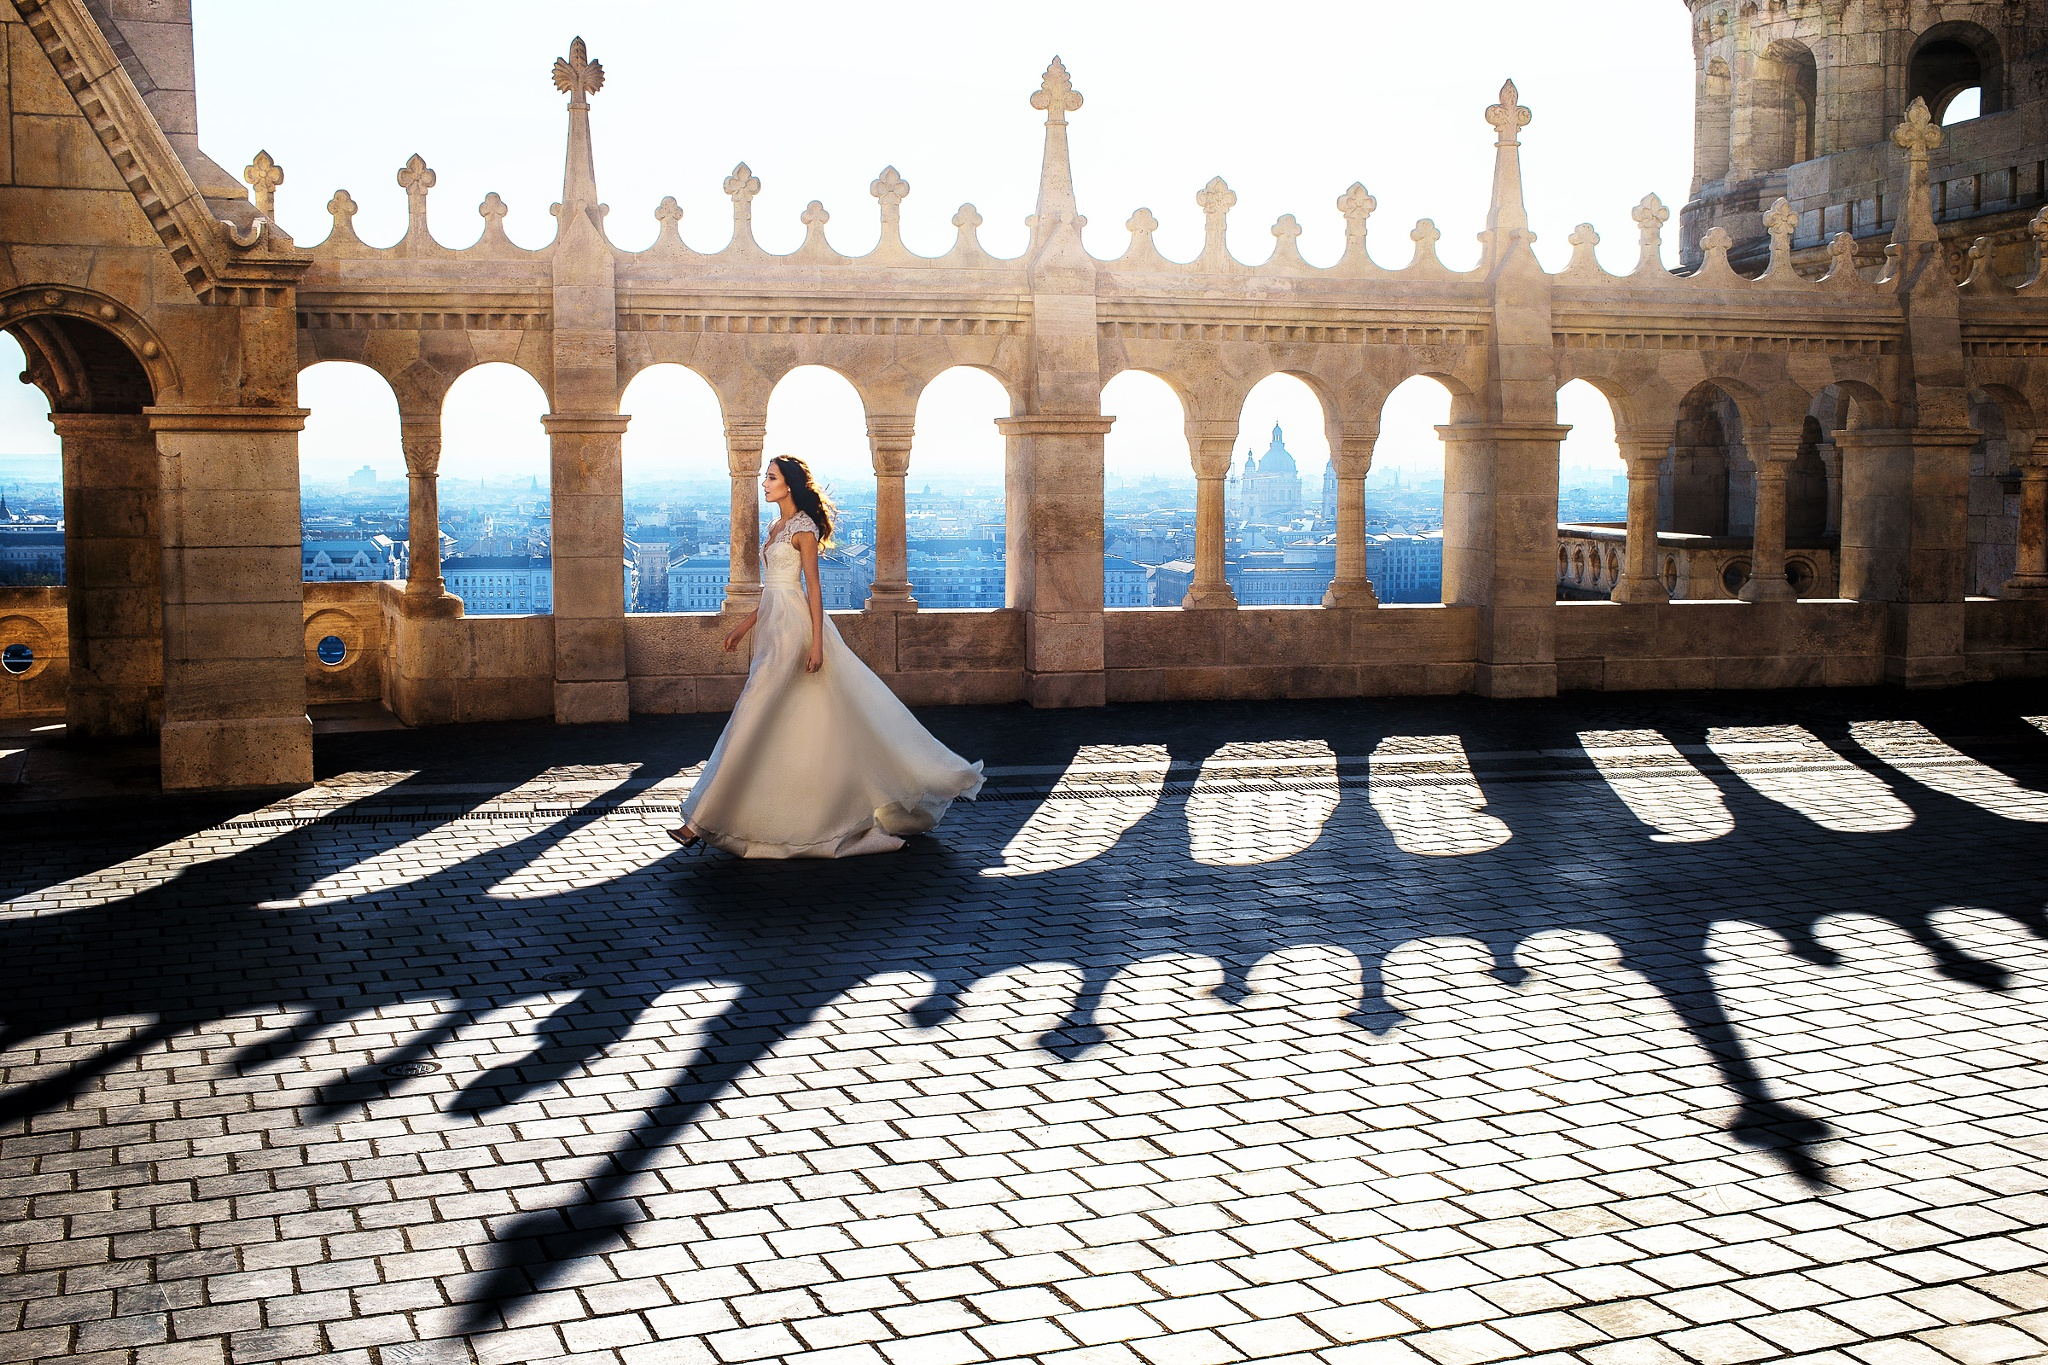 Photo in Wedding #sobokar #weddingphotographer #bride #portrait #light #castle #weddingdress #budapest #professionalphotography #lovestory #wedding #weddingphoto #sobokar.com